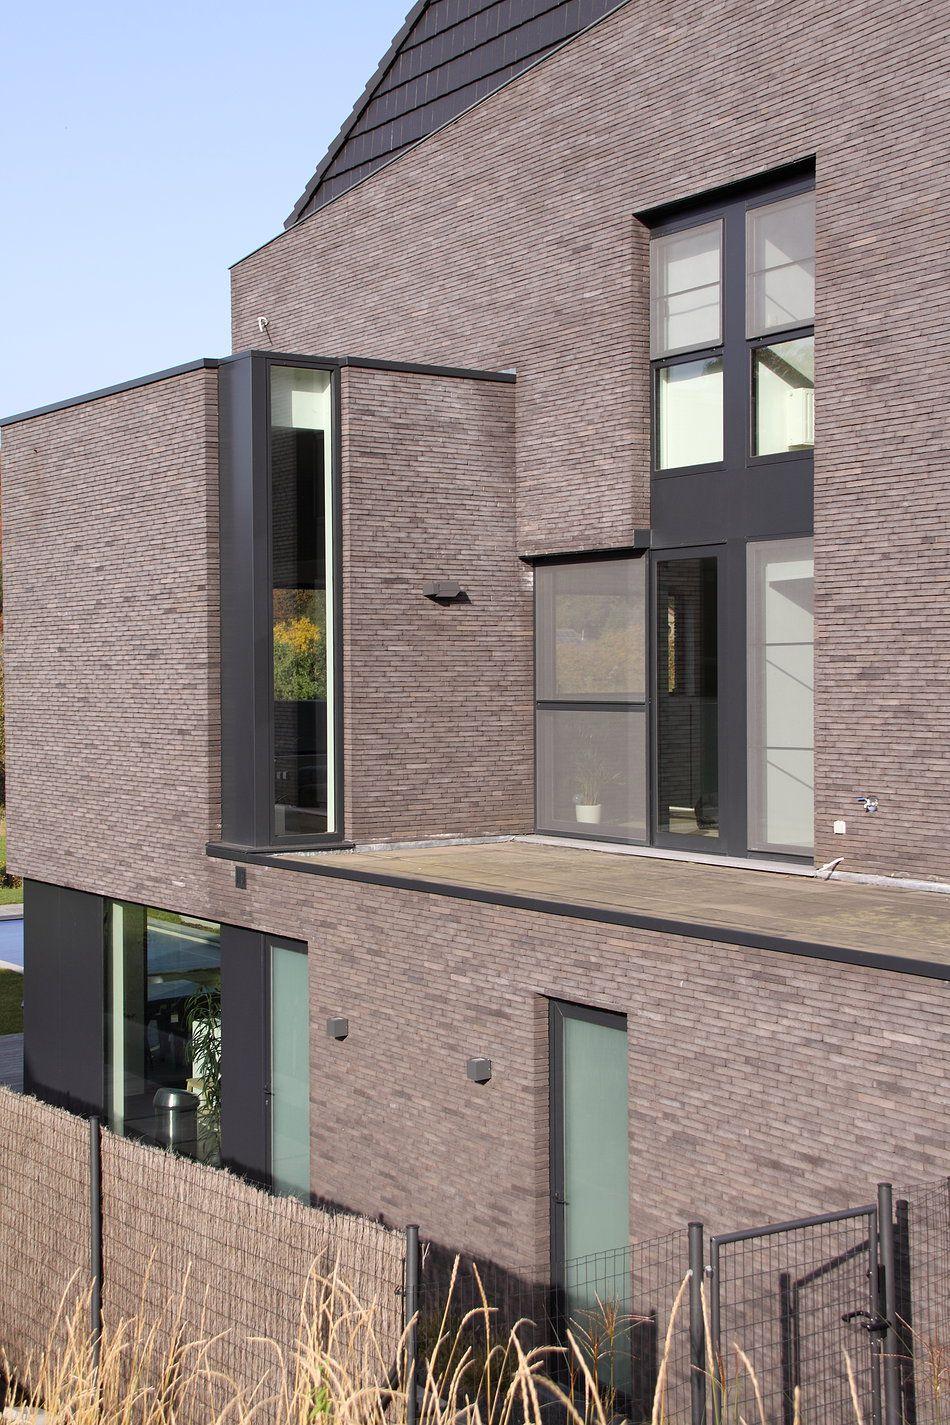 ral 7021 mat Kessel-Lo | Architecture - Façades & Volumes ...